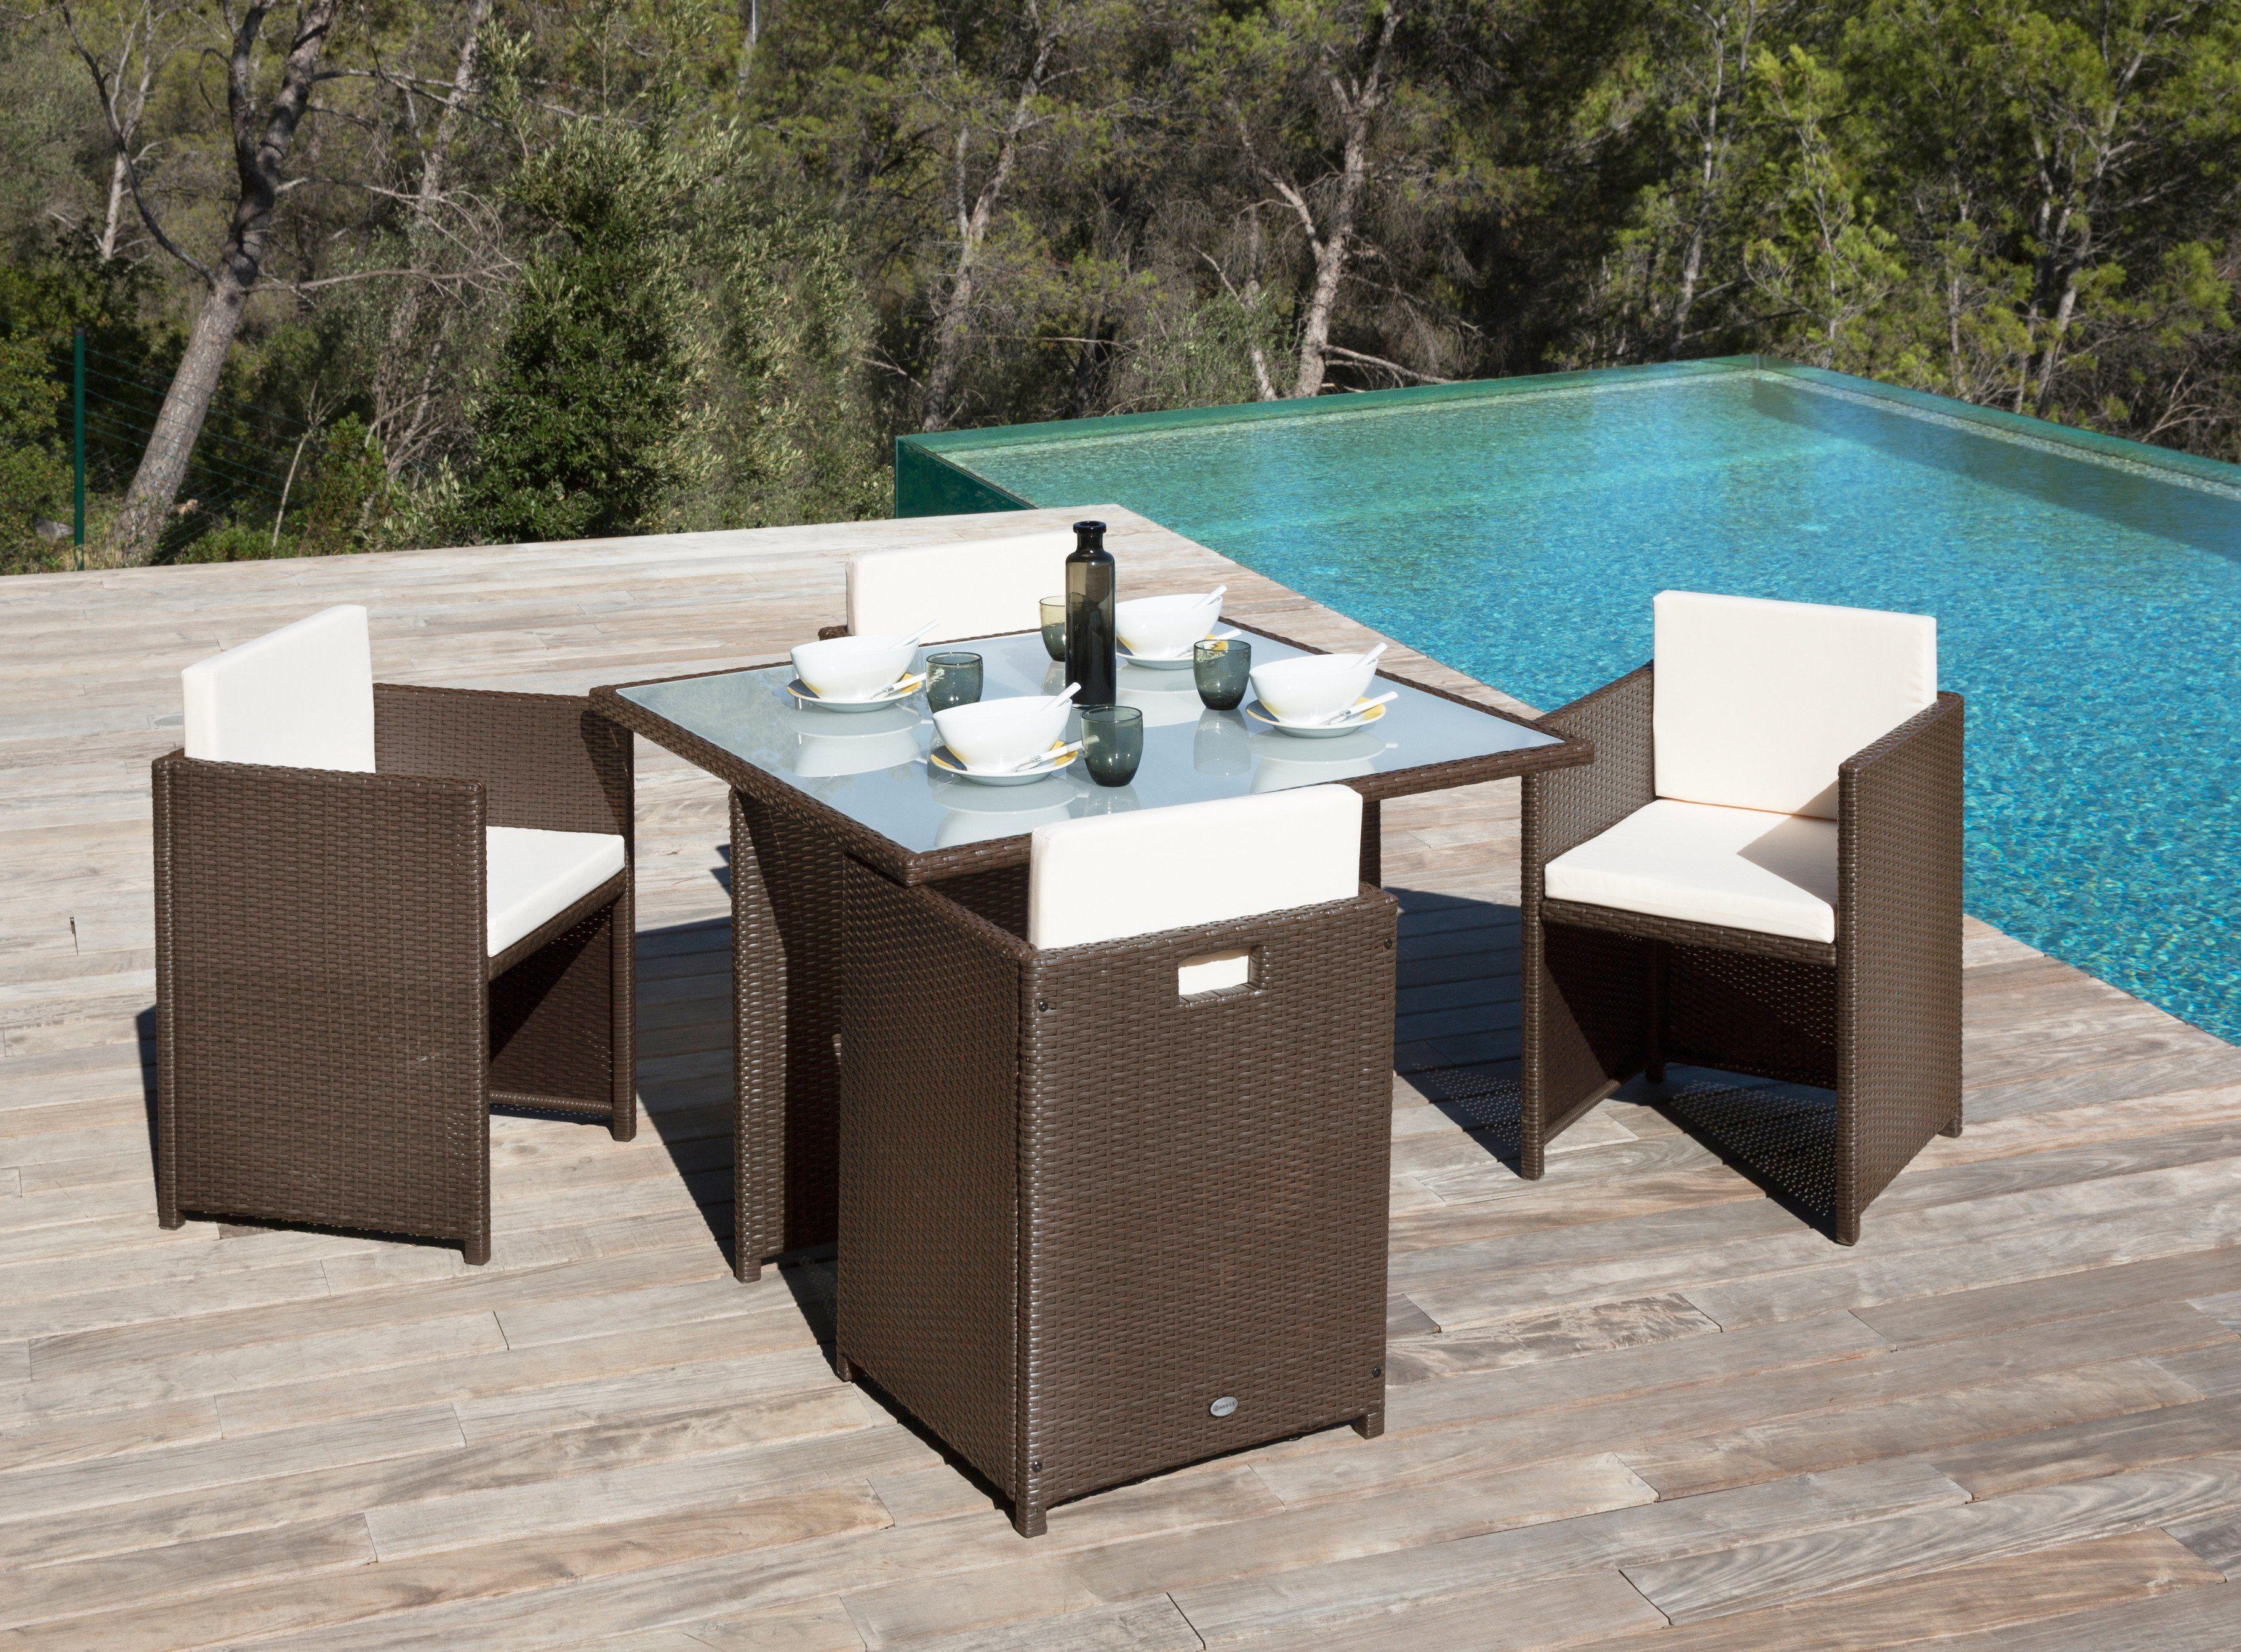 Gartenmobel Edelstahl Und Holz : Gartenmöbelset »Verona«, 4 Sessel, Tisch 110×110 cm, Polyrattan